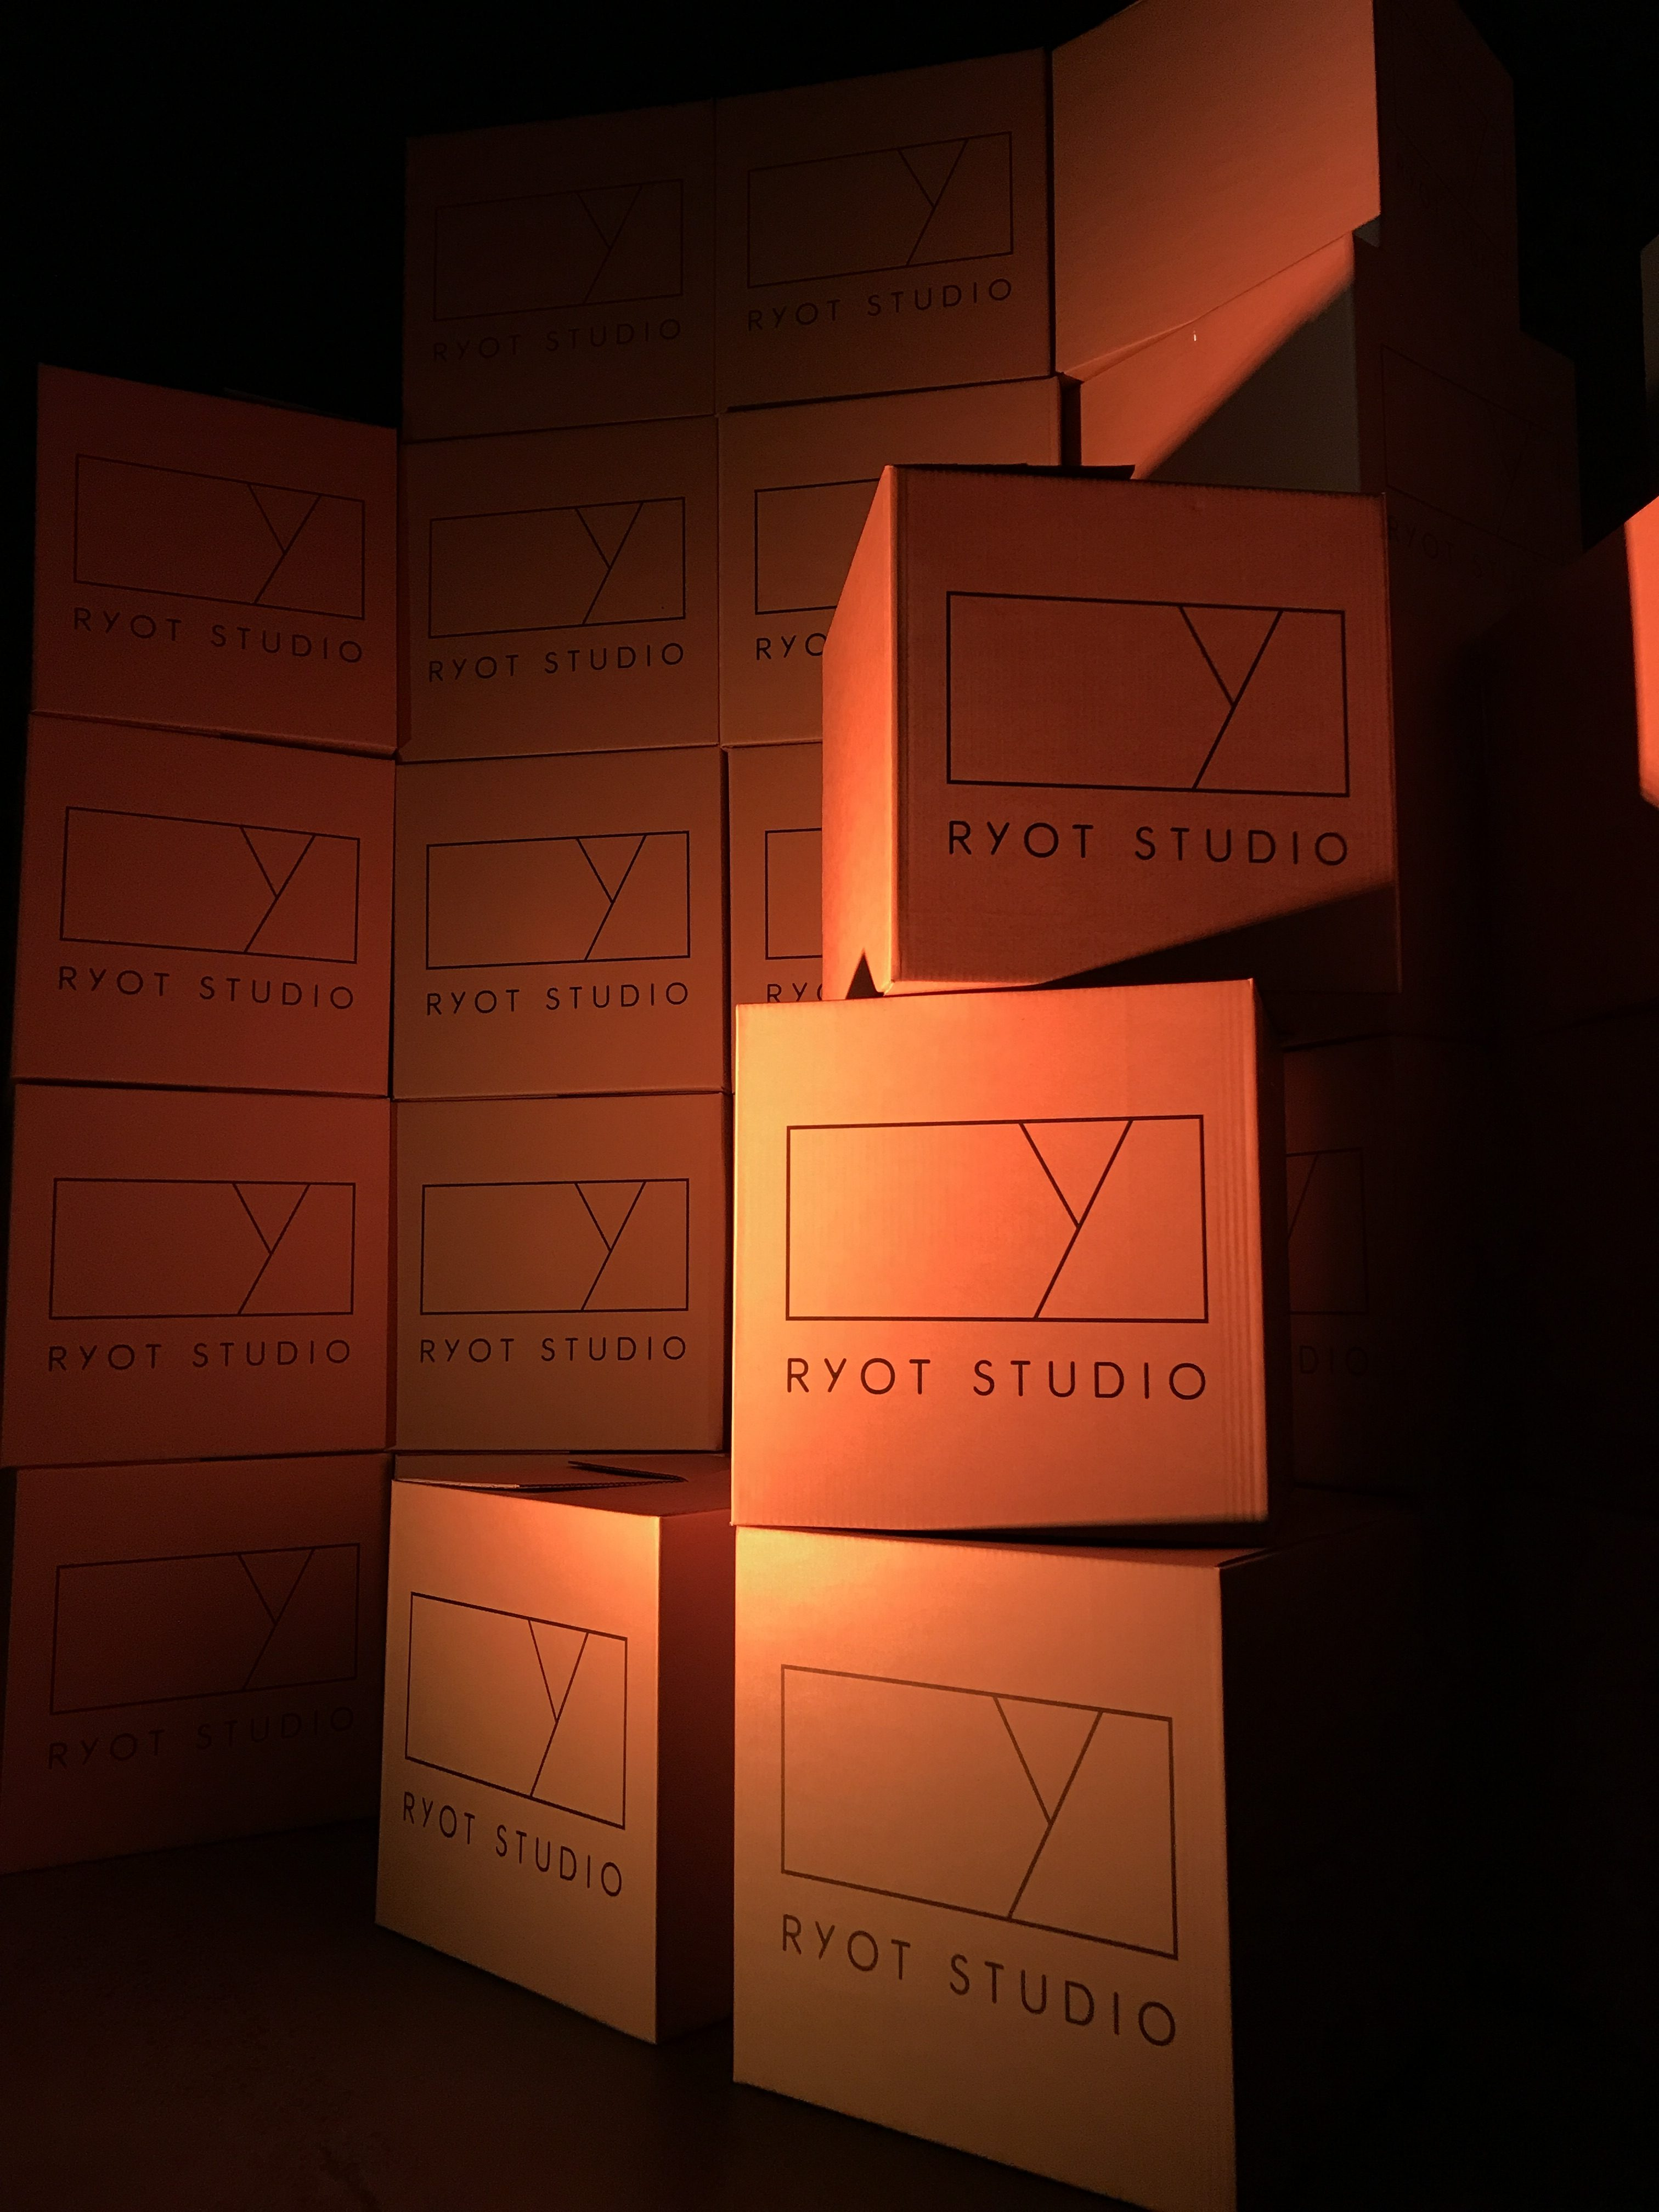 Verizon Media's RYOT Studio experiential event showcases the future of immersive media